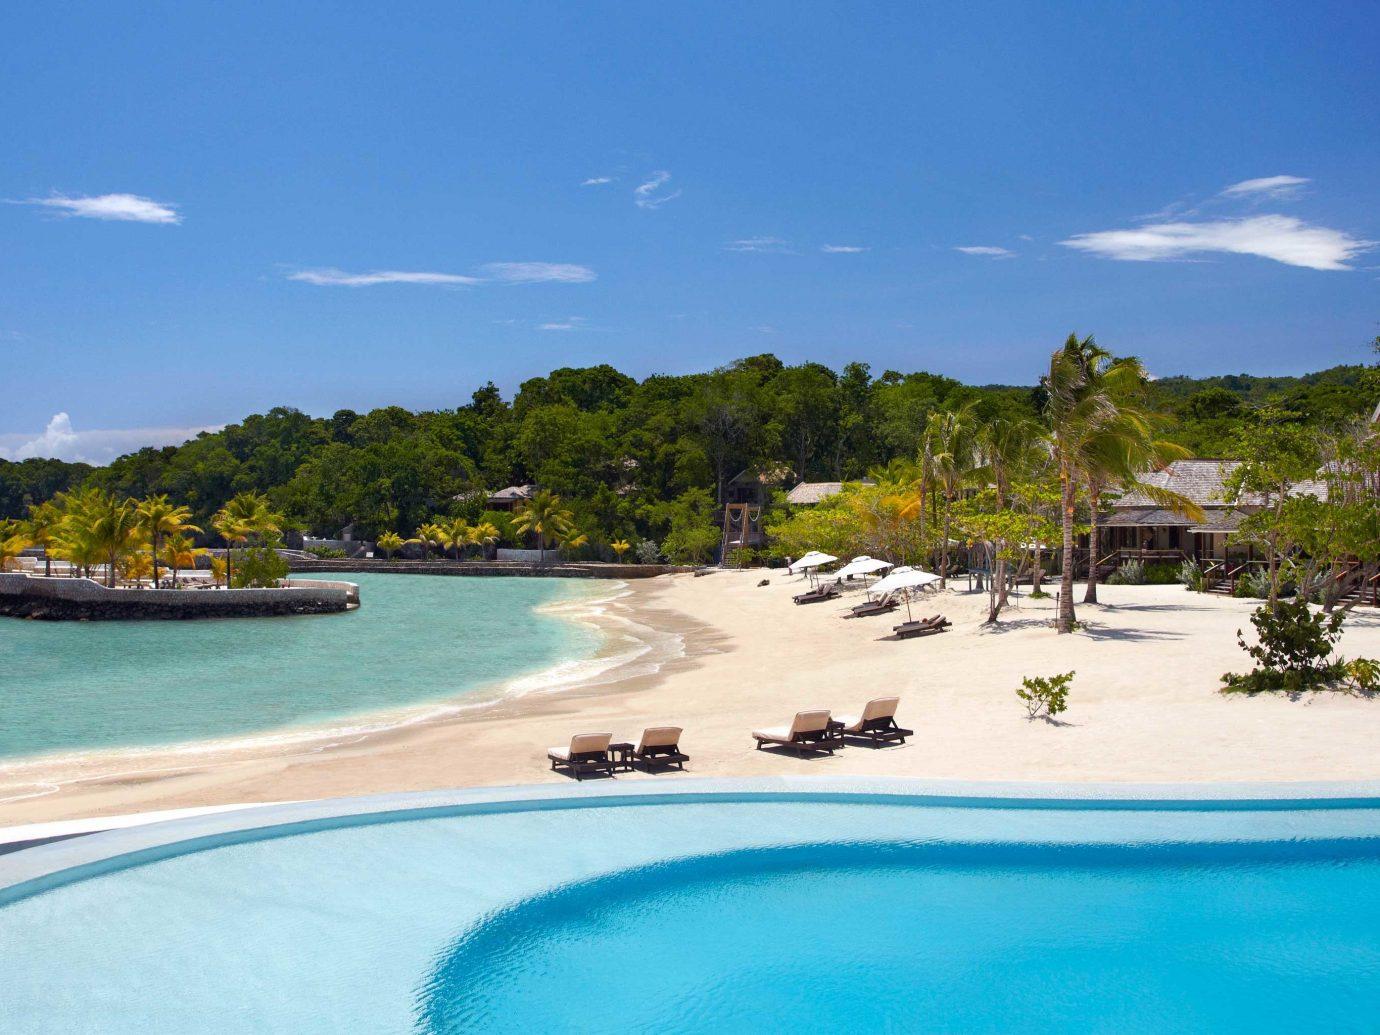 Beach and pool at GoldenEye, Jamaica